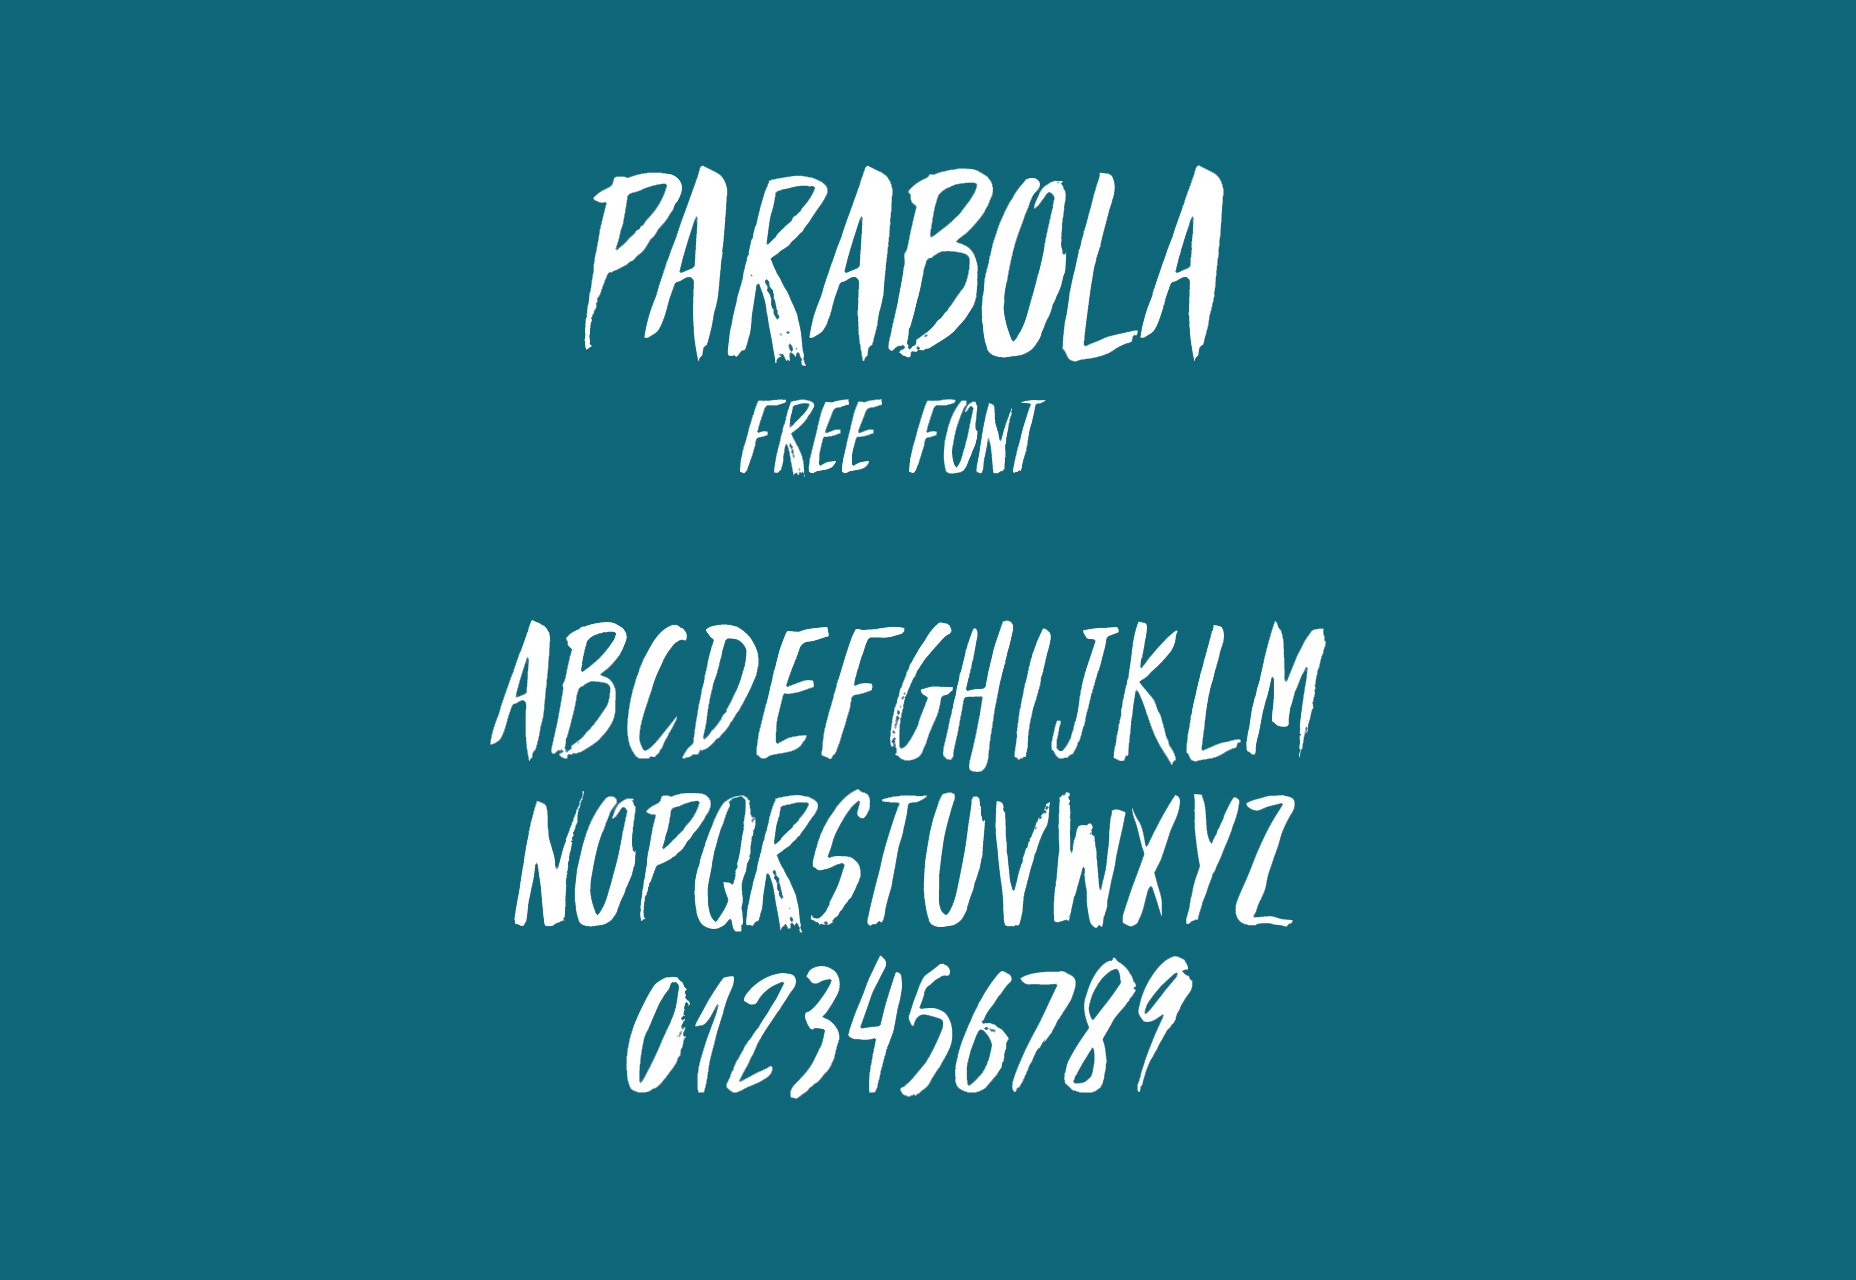 parabola-brush-hand-written-style-font